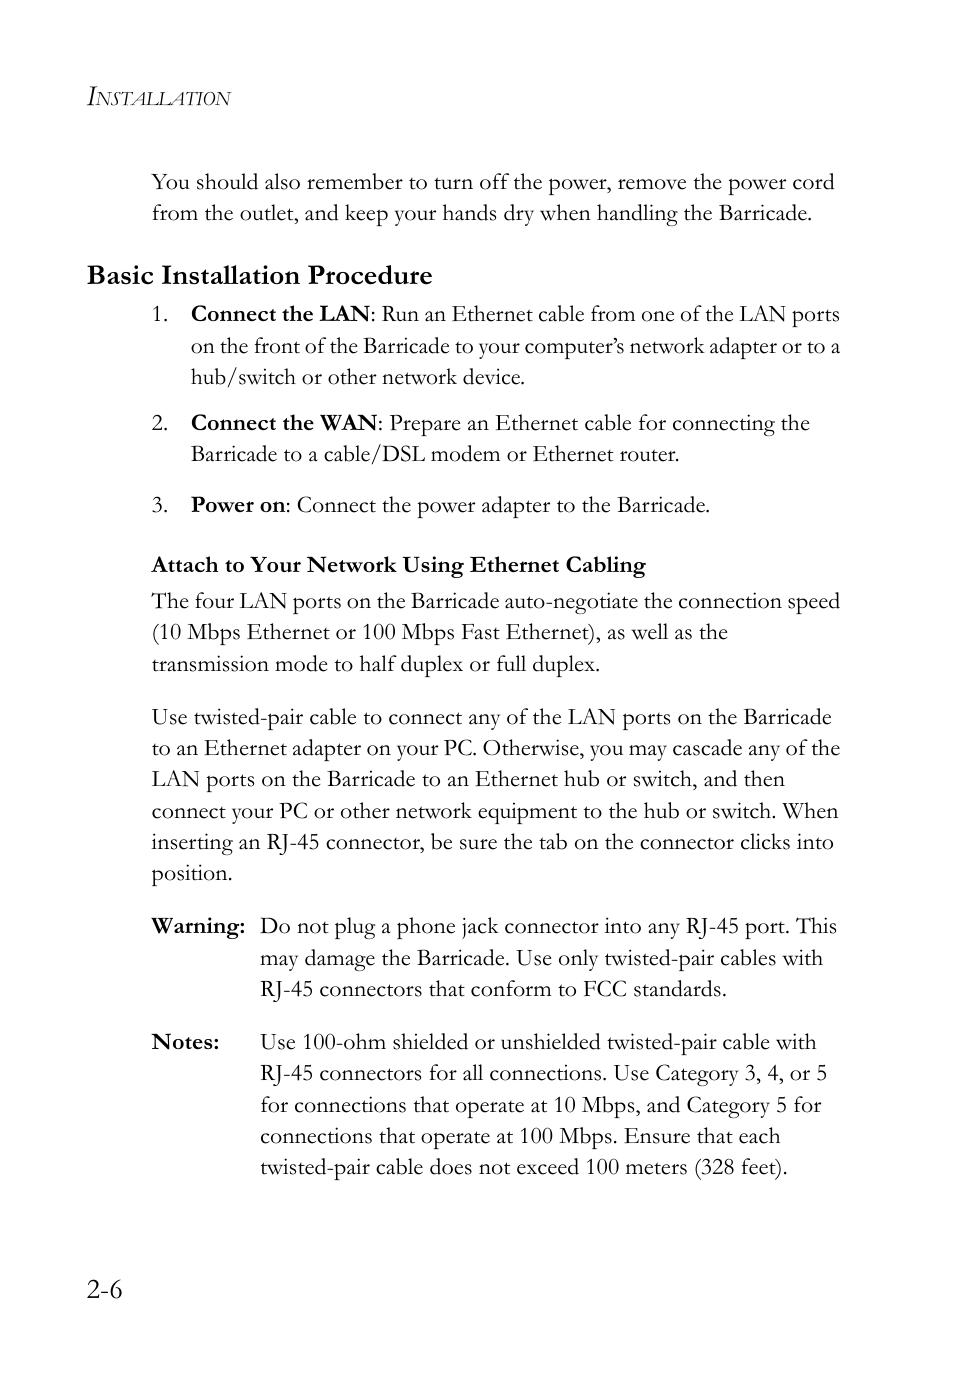 hight resolution of basic installation procedure smc networks smc barricade smc7004vbr user manual page 24 122